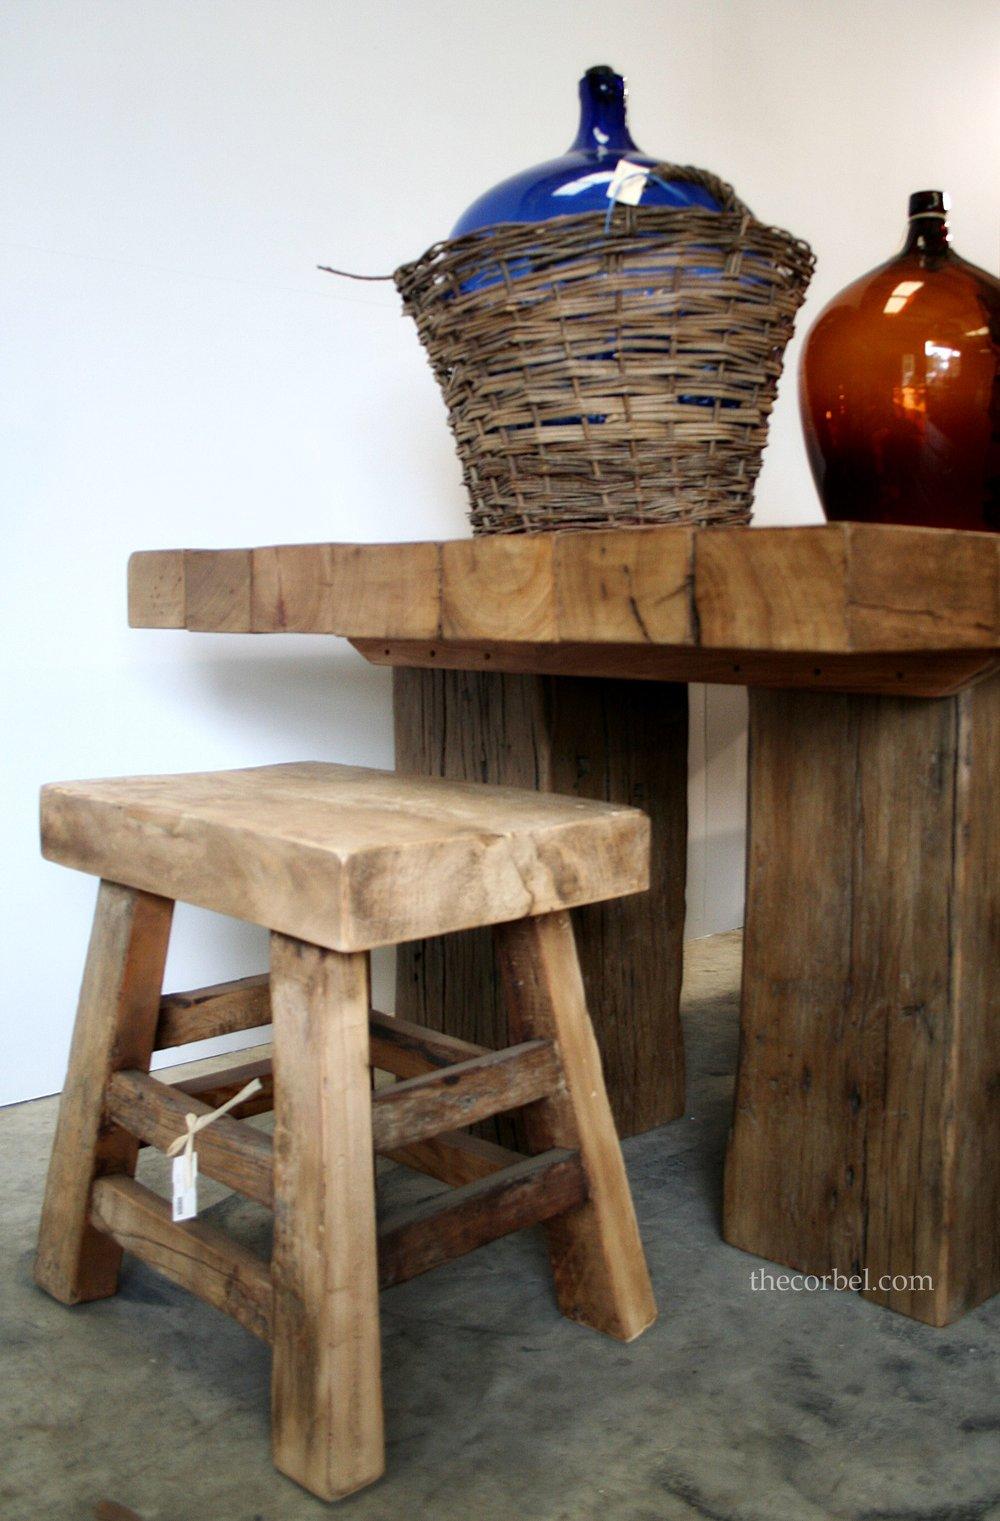 Beam legs thicktop table2 WM.jpg